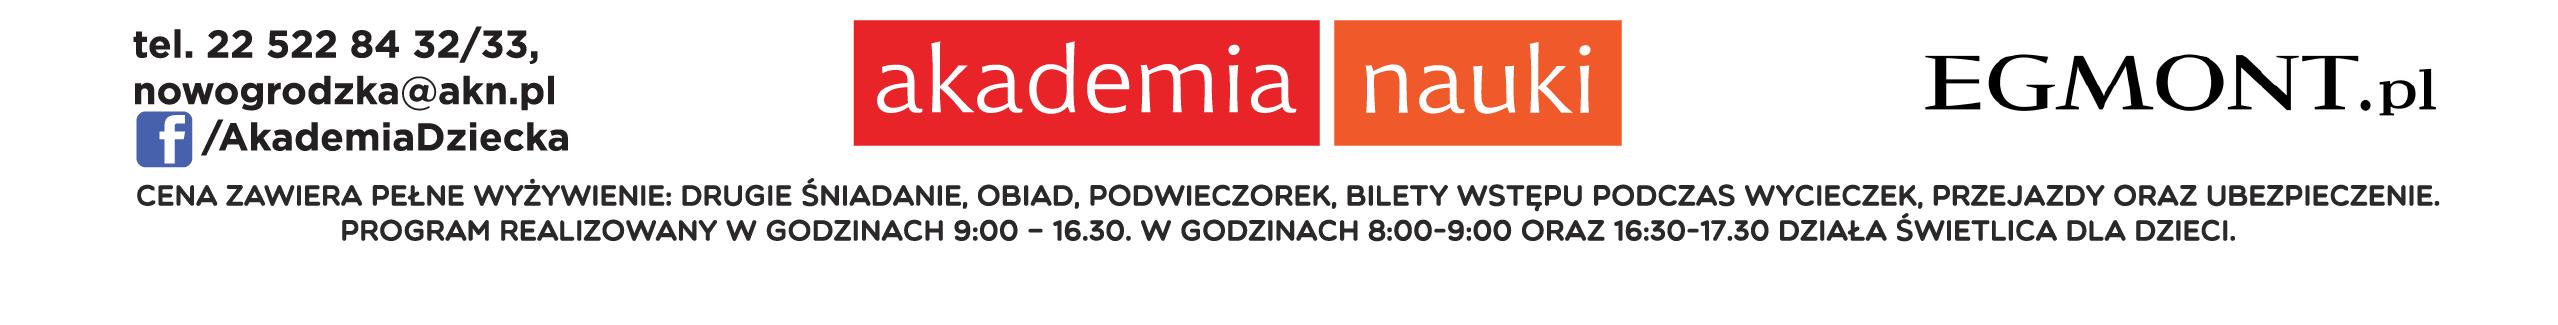 akademia nauki Warszawa stopka